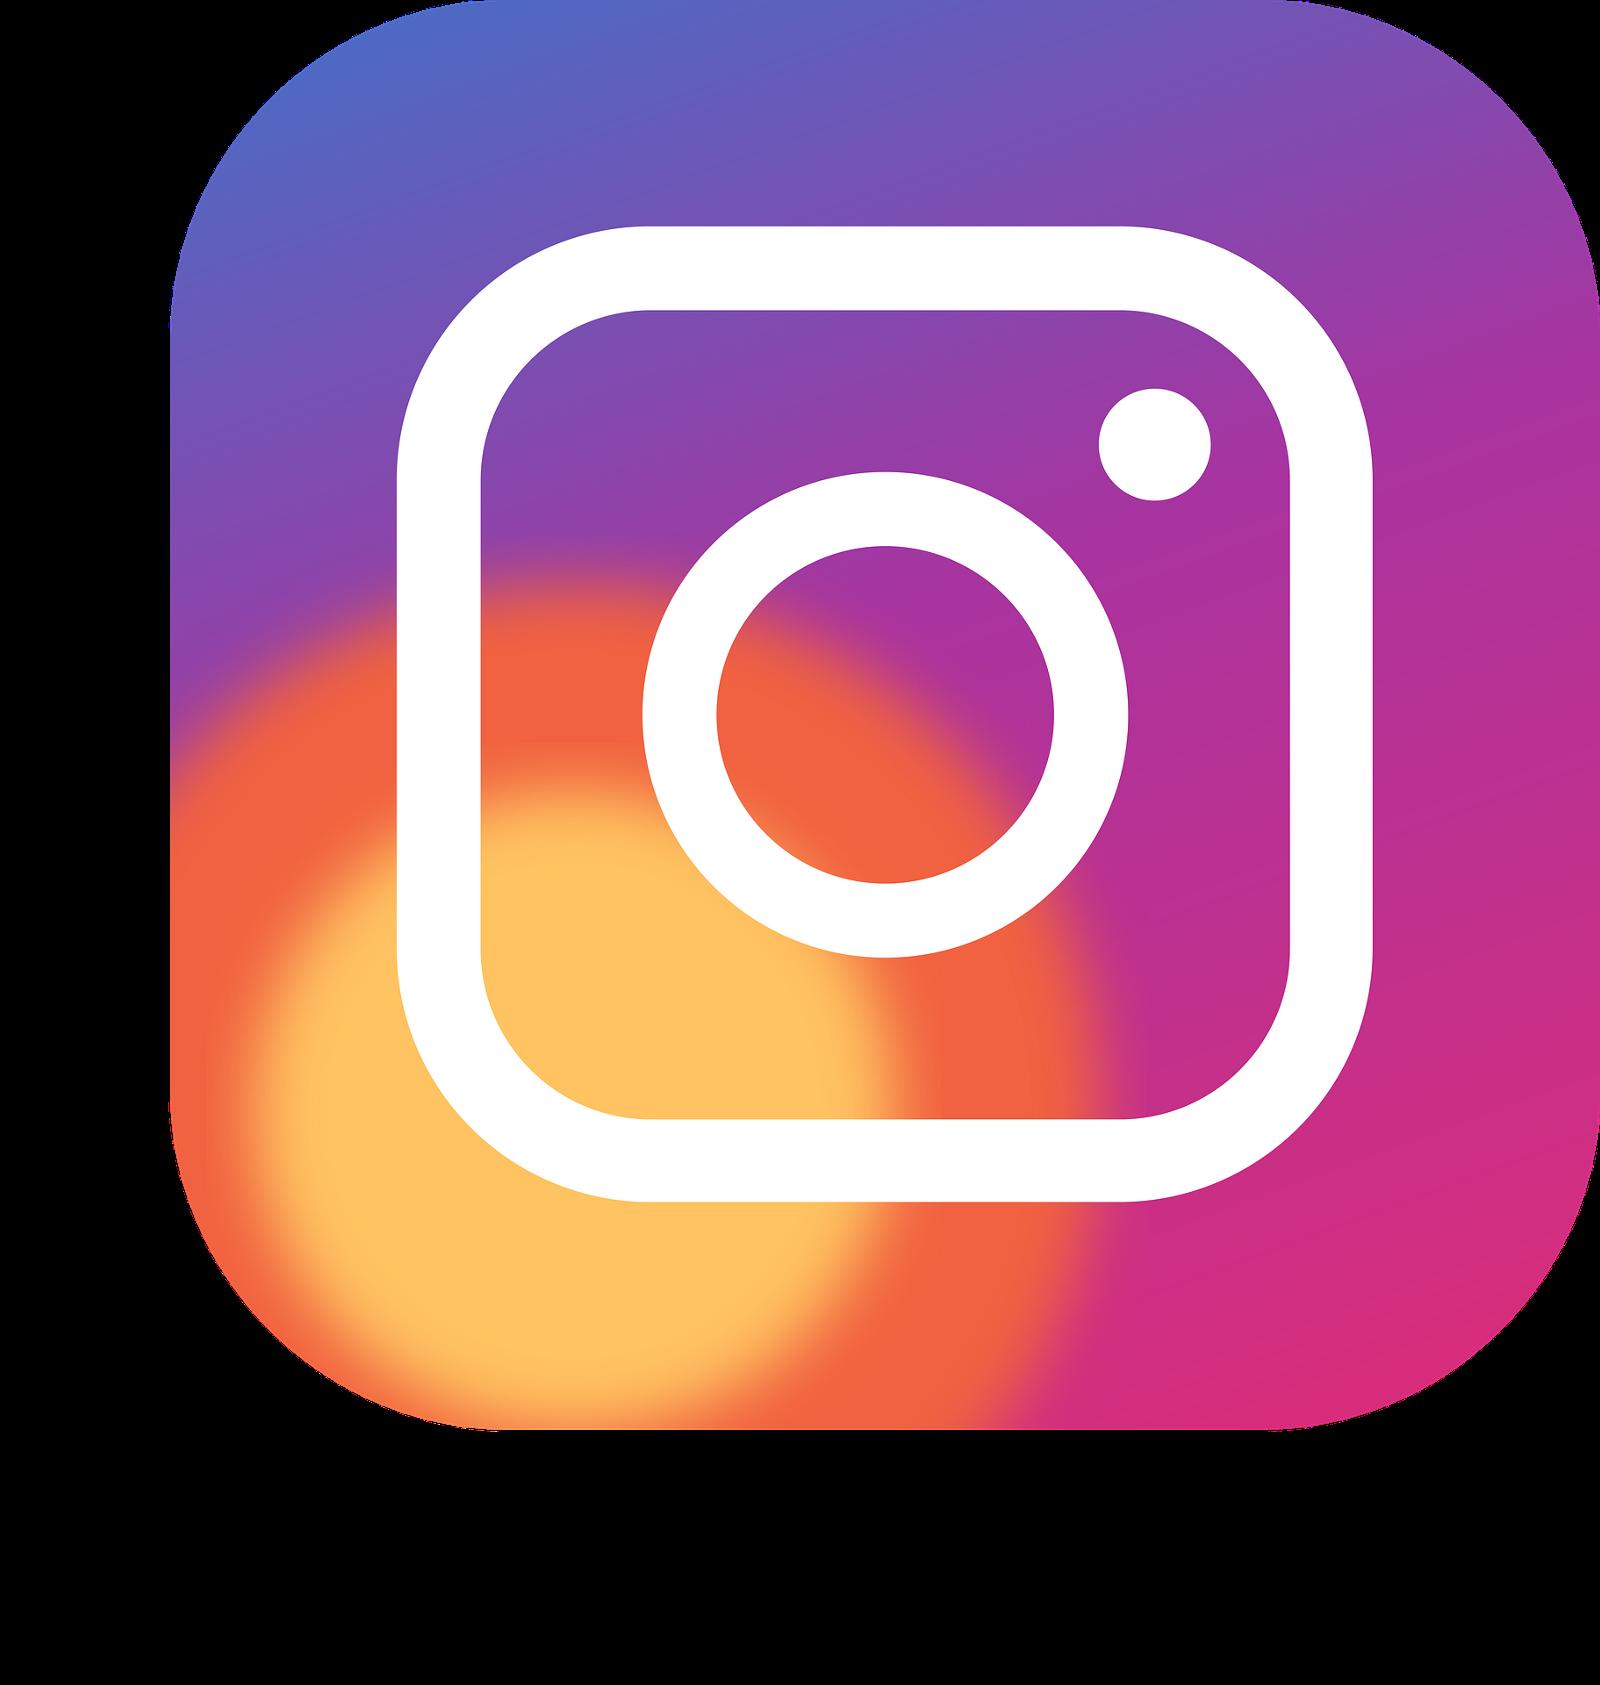 Instagram social media clipart jpg transparent download Power Of Prospecting on Instagram: 5 ways to get more engagement ... jpg transparent download